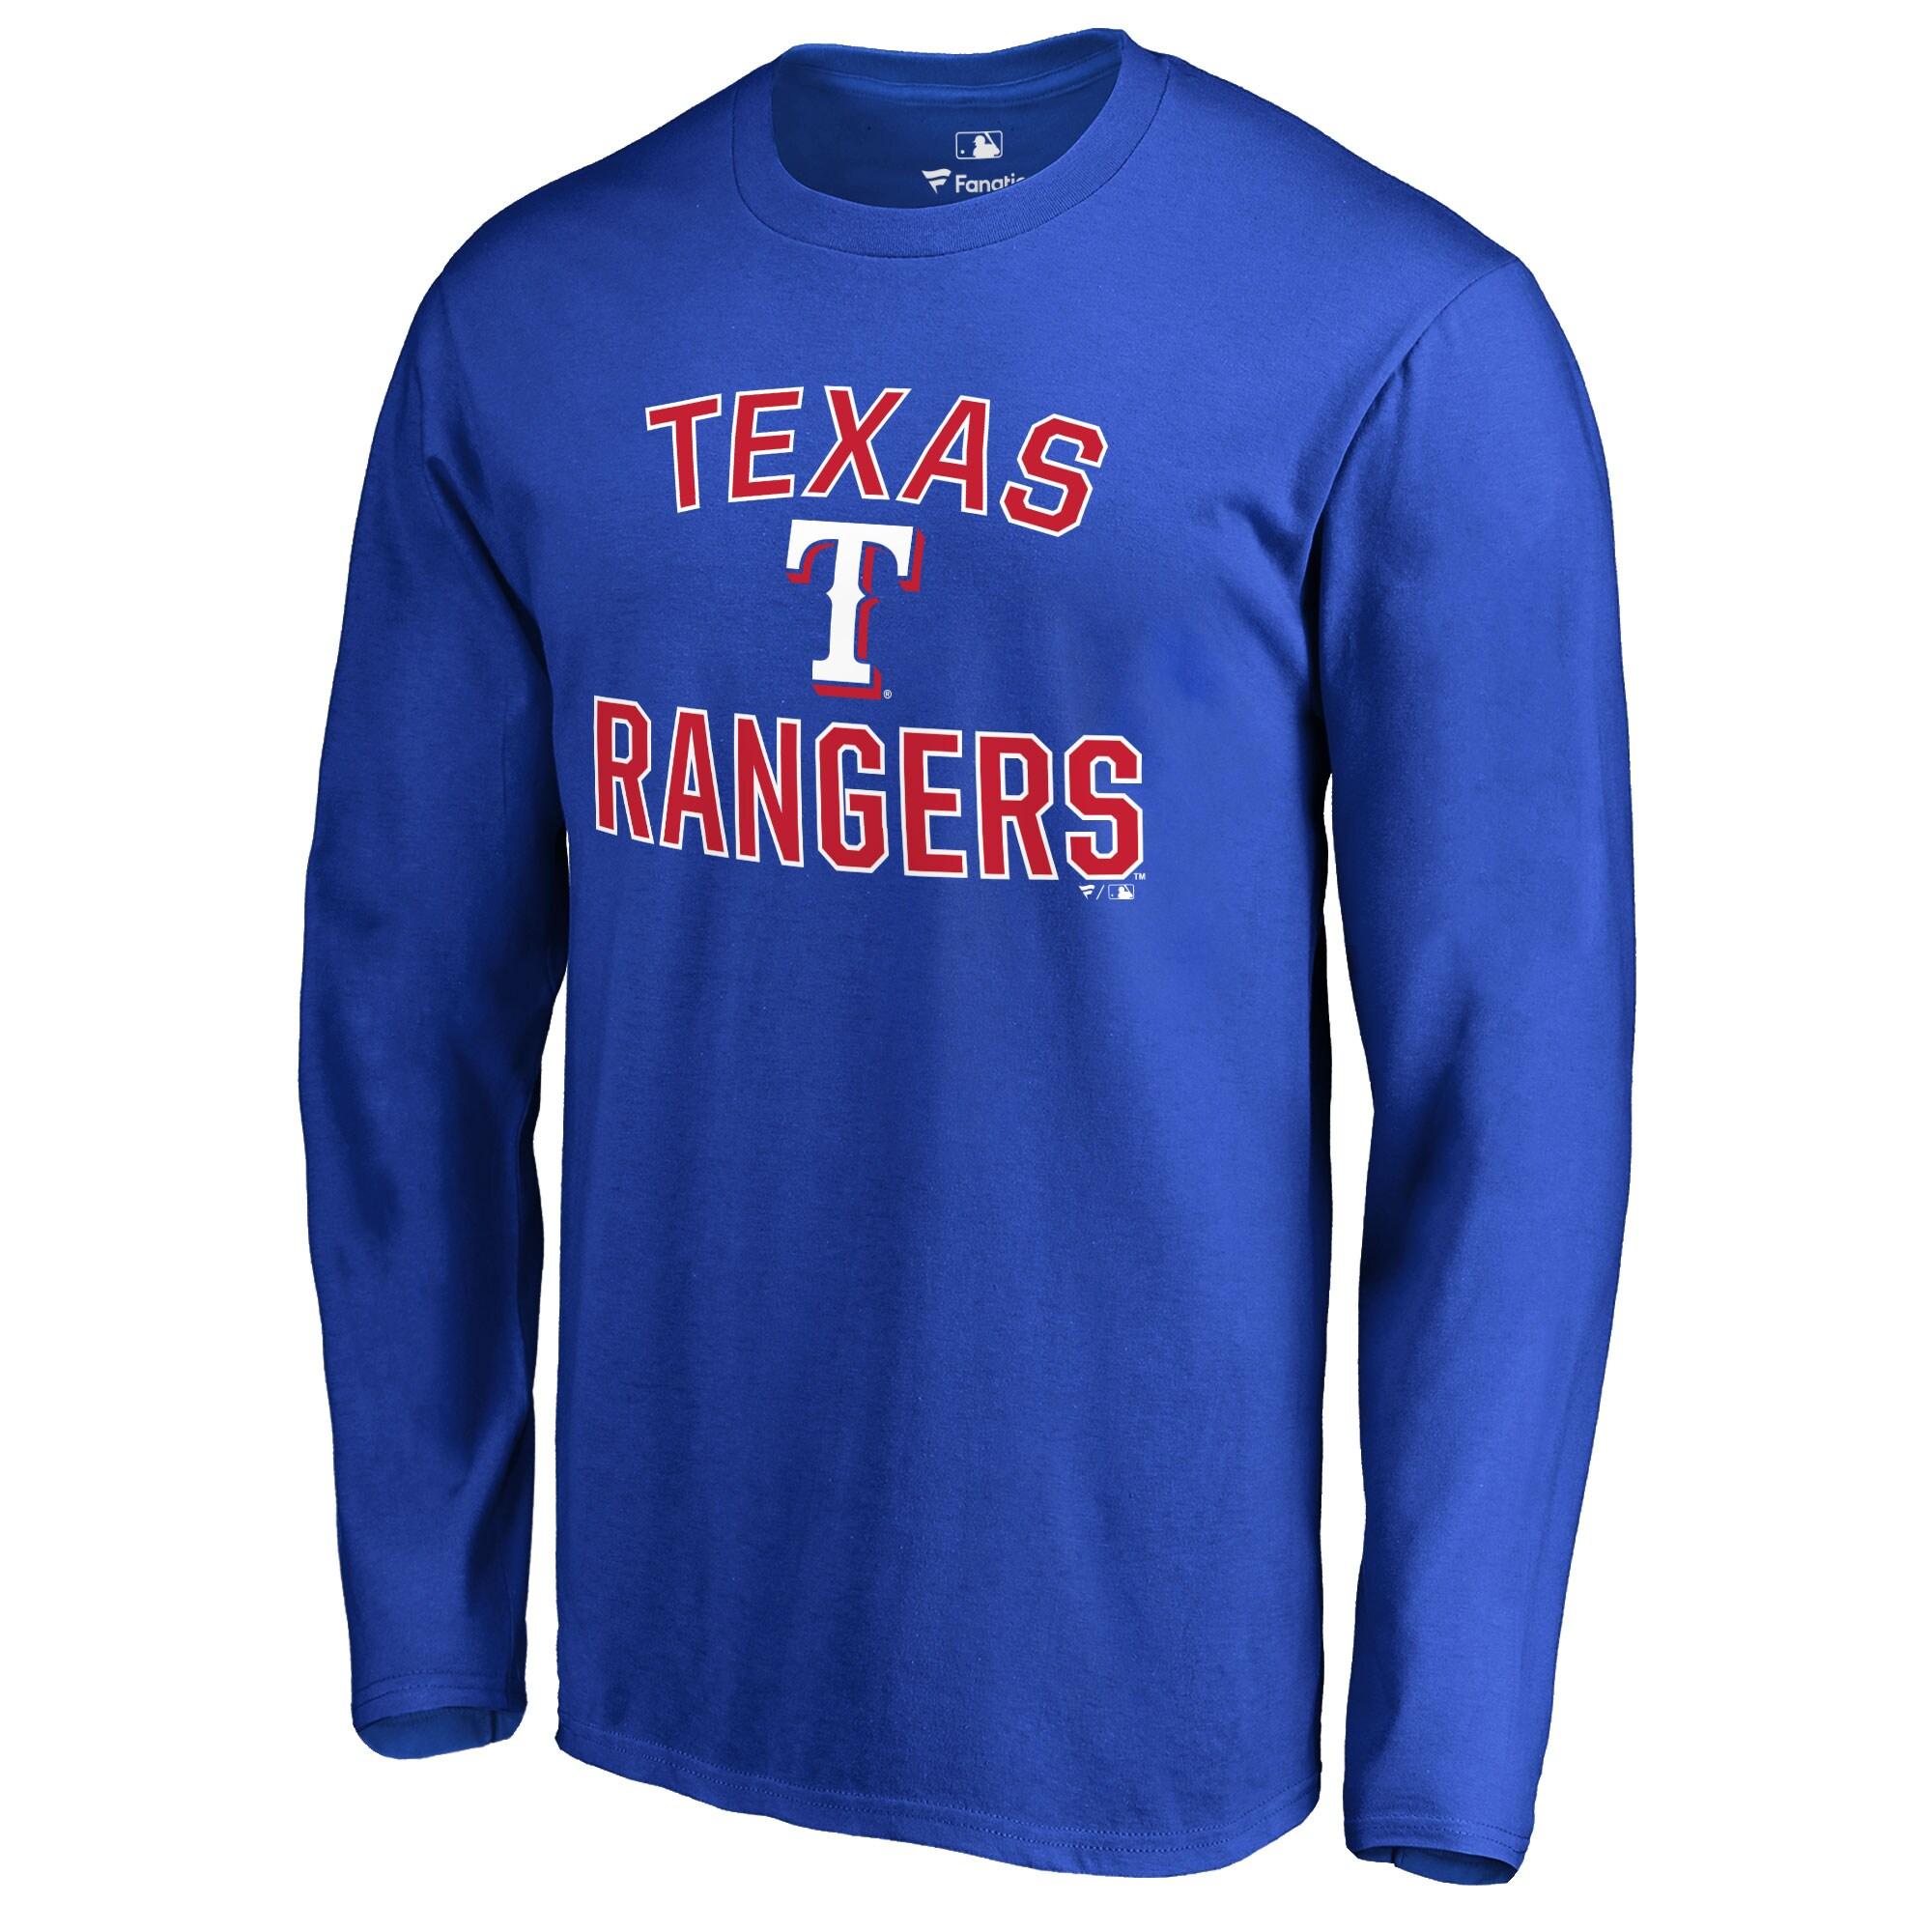 Texas Rangers Victory Arch Long Sleeve T-Shirt - Royal